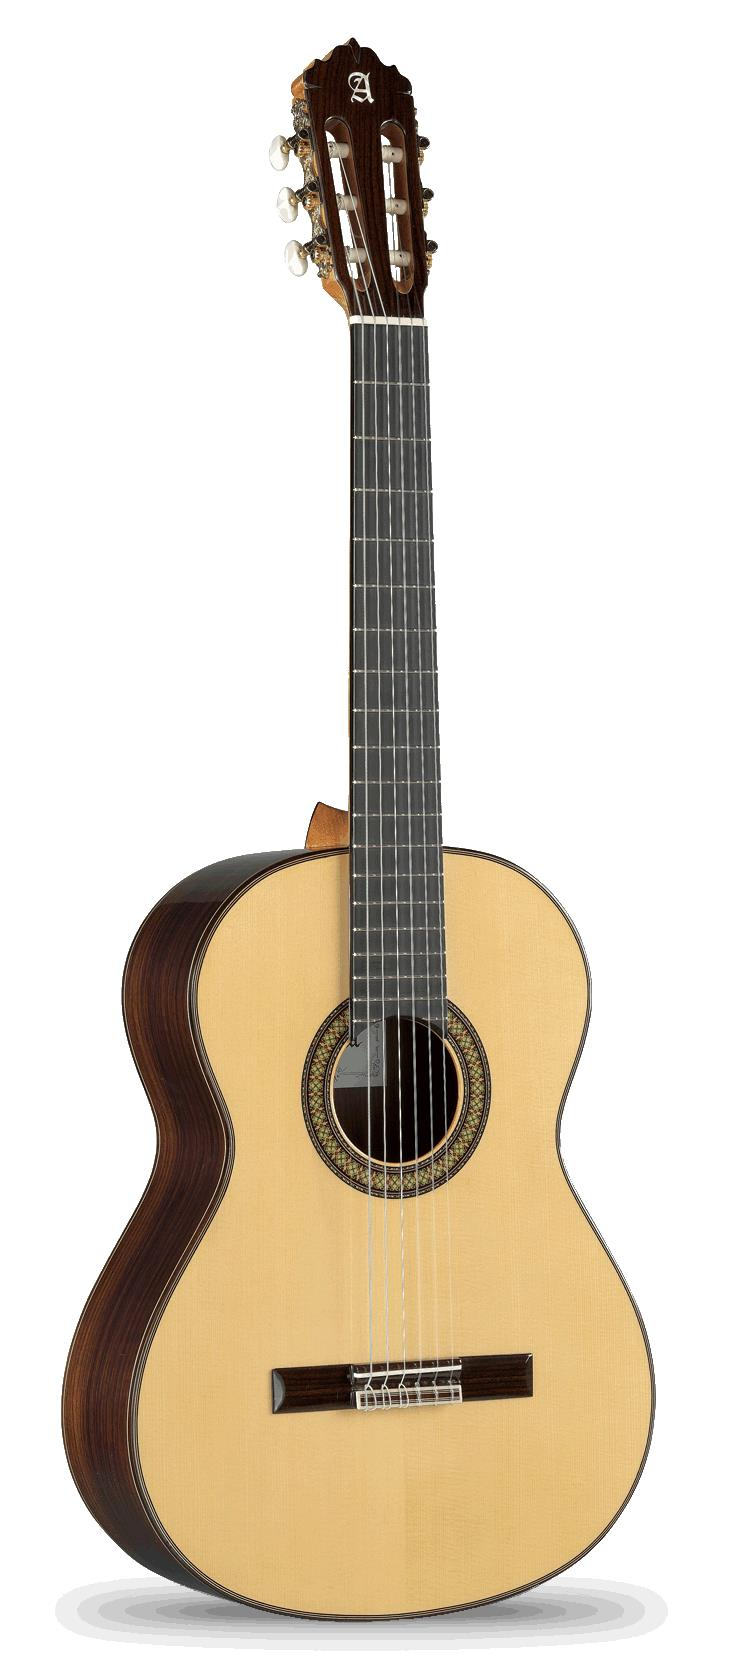 813-7PA Classical Conservatory 7PA Классическая гитара, Alhambra